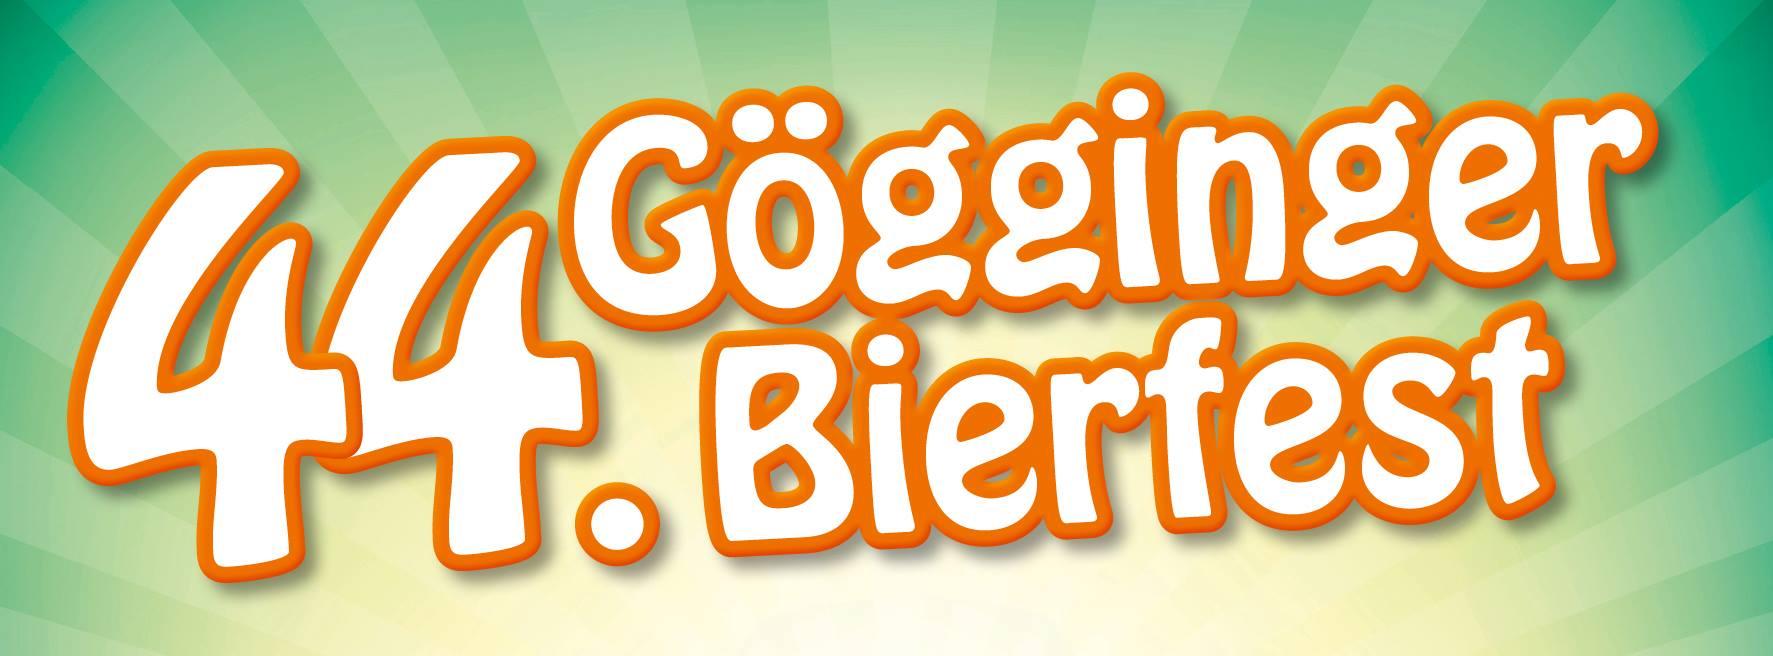 goegginger-bierfest-2015